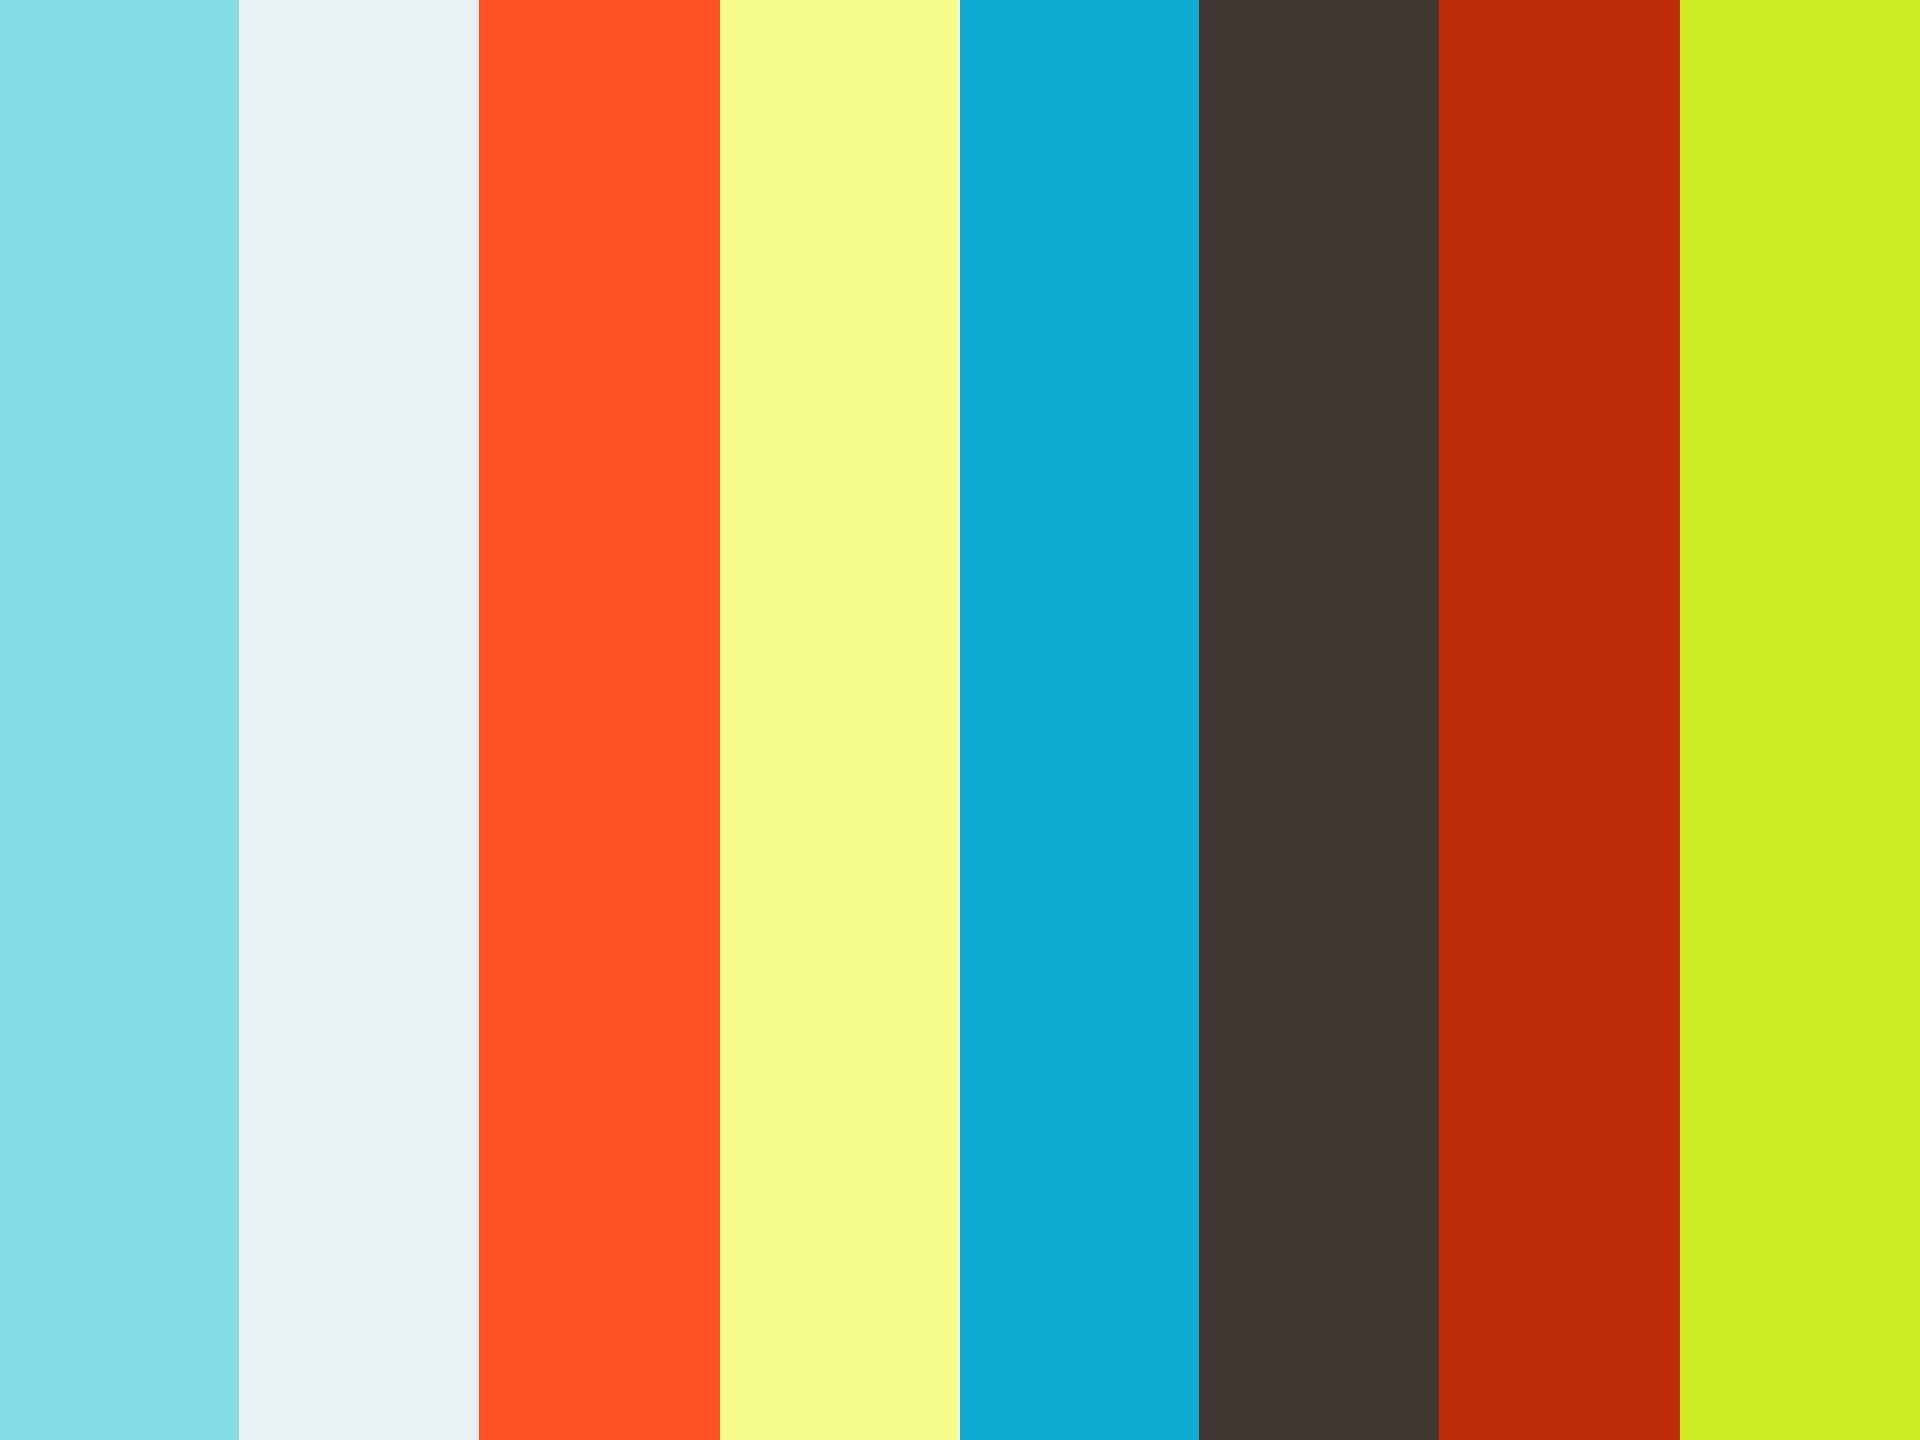 MERCEDES BENZ GLC 200 - BLACK - 2021